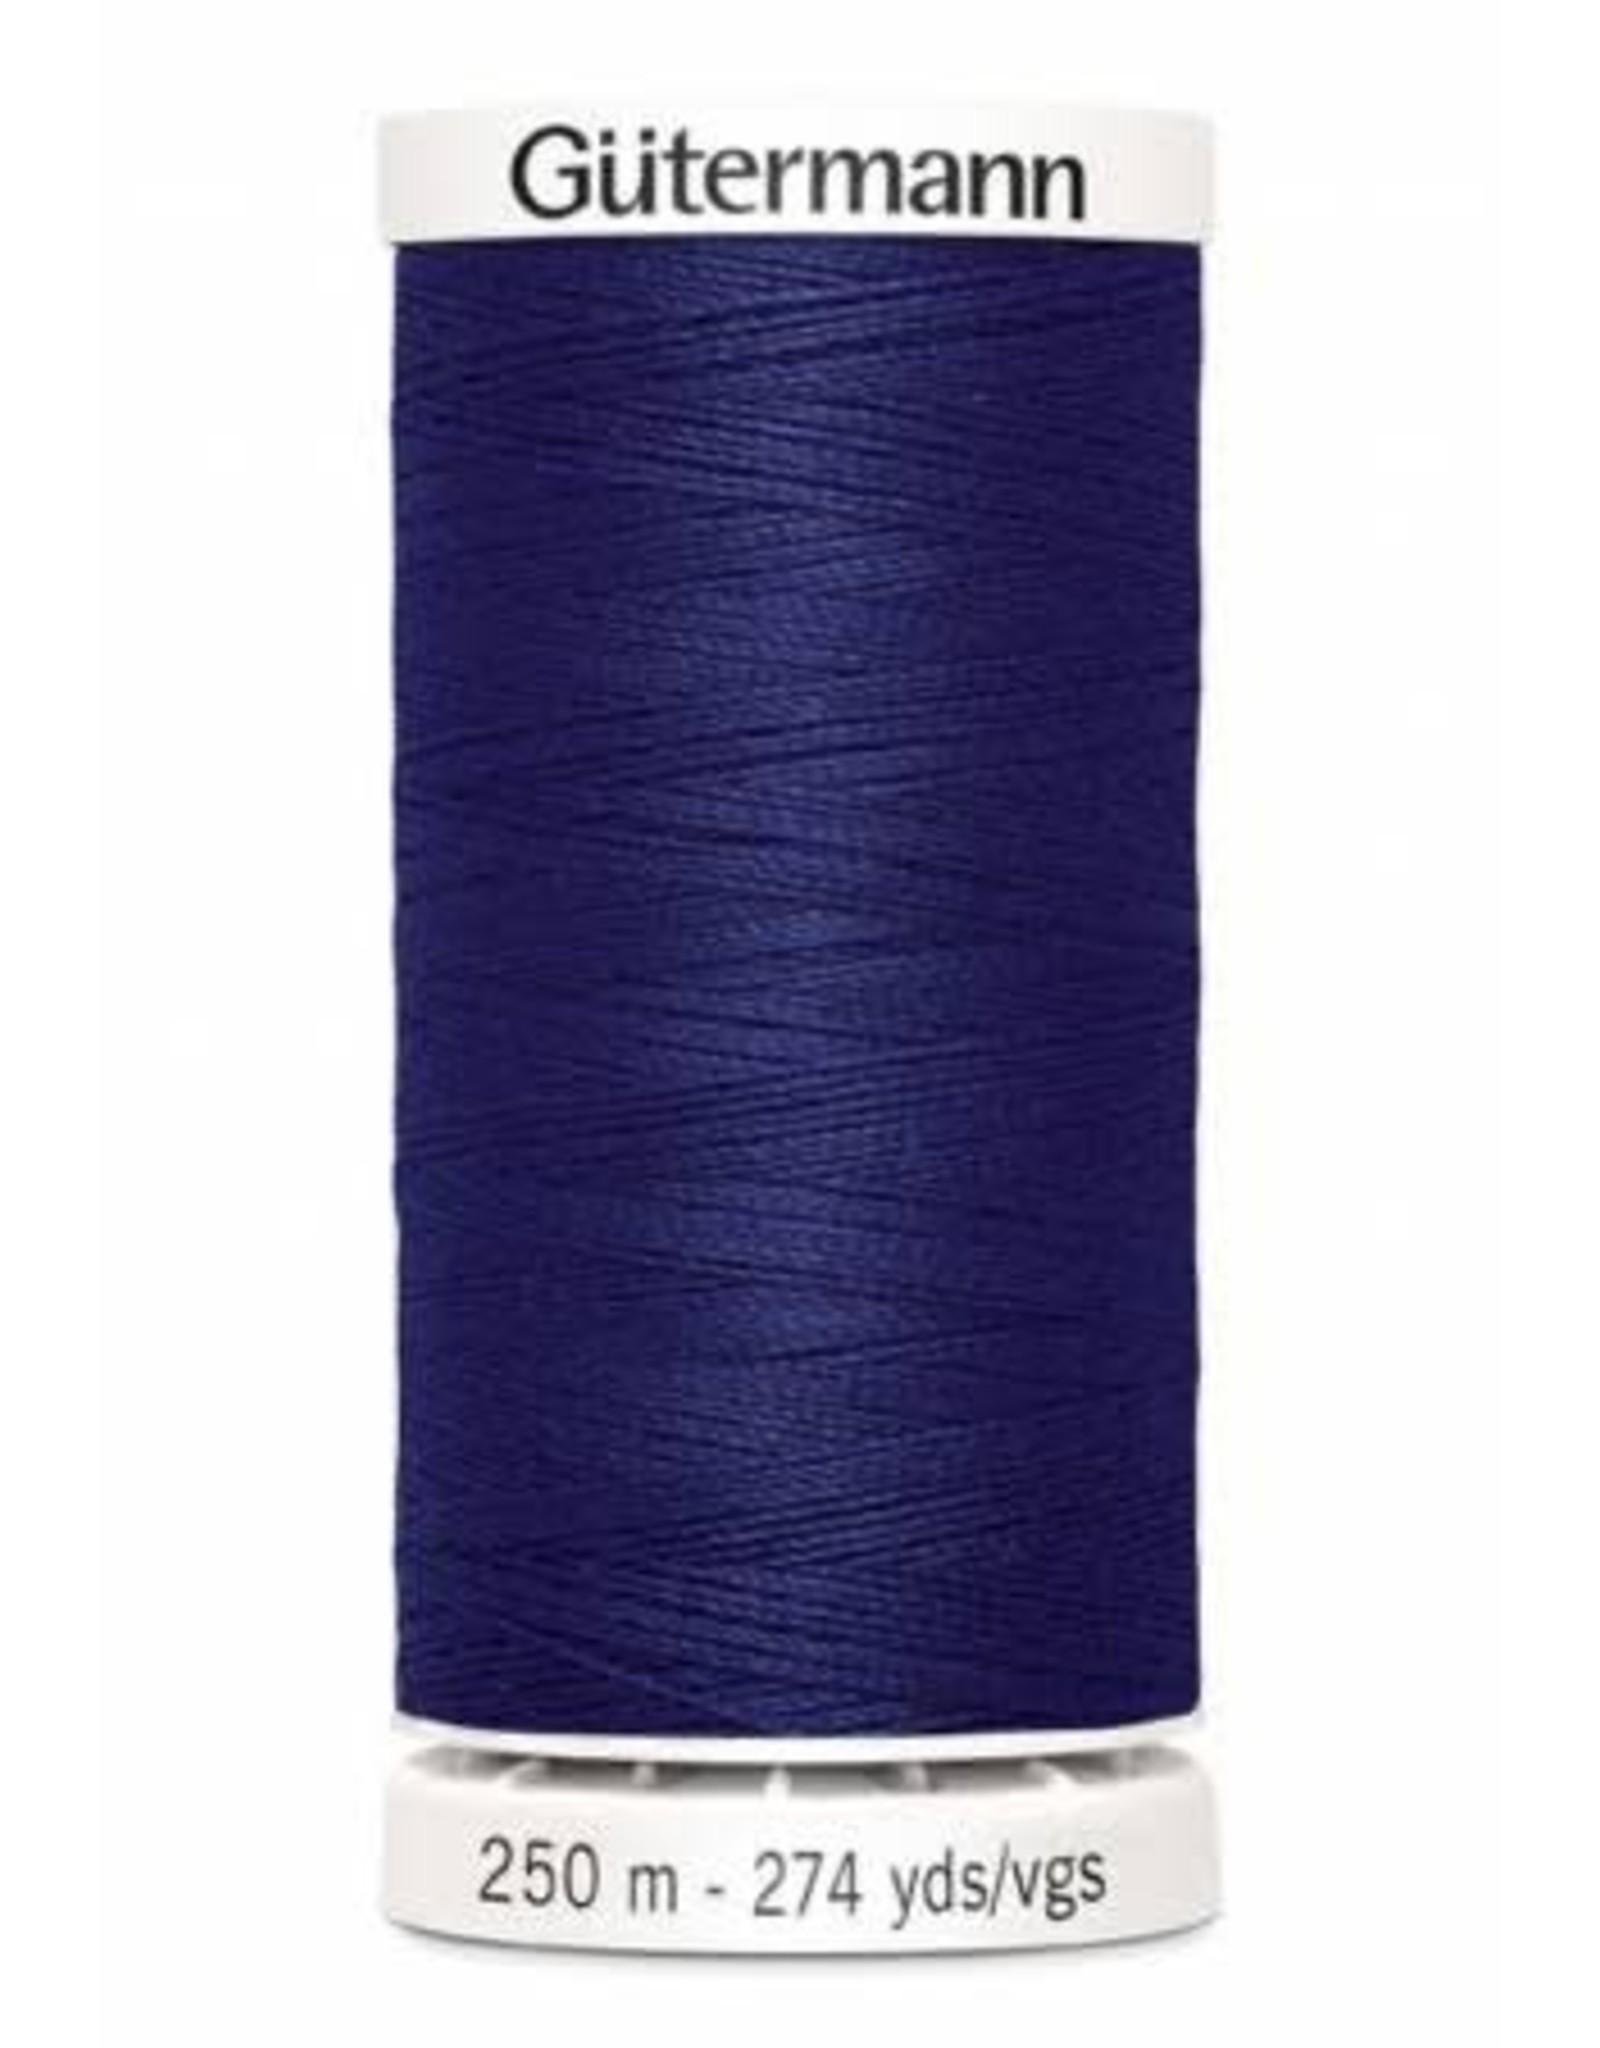 Gutermann Gutermann Thread, 250M-266 Bright Navy Blue, Sew-All Polyester All Purpose Thread, 250m/273yds